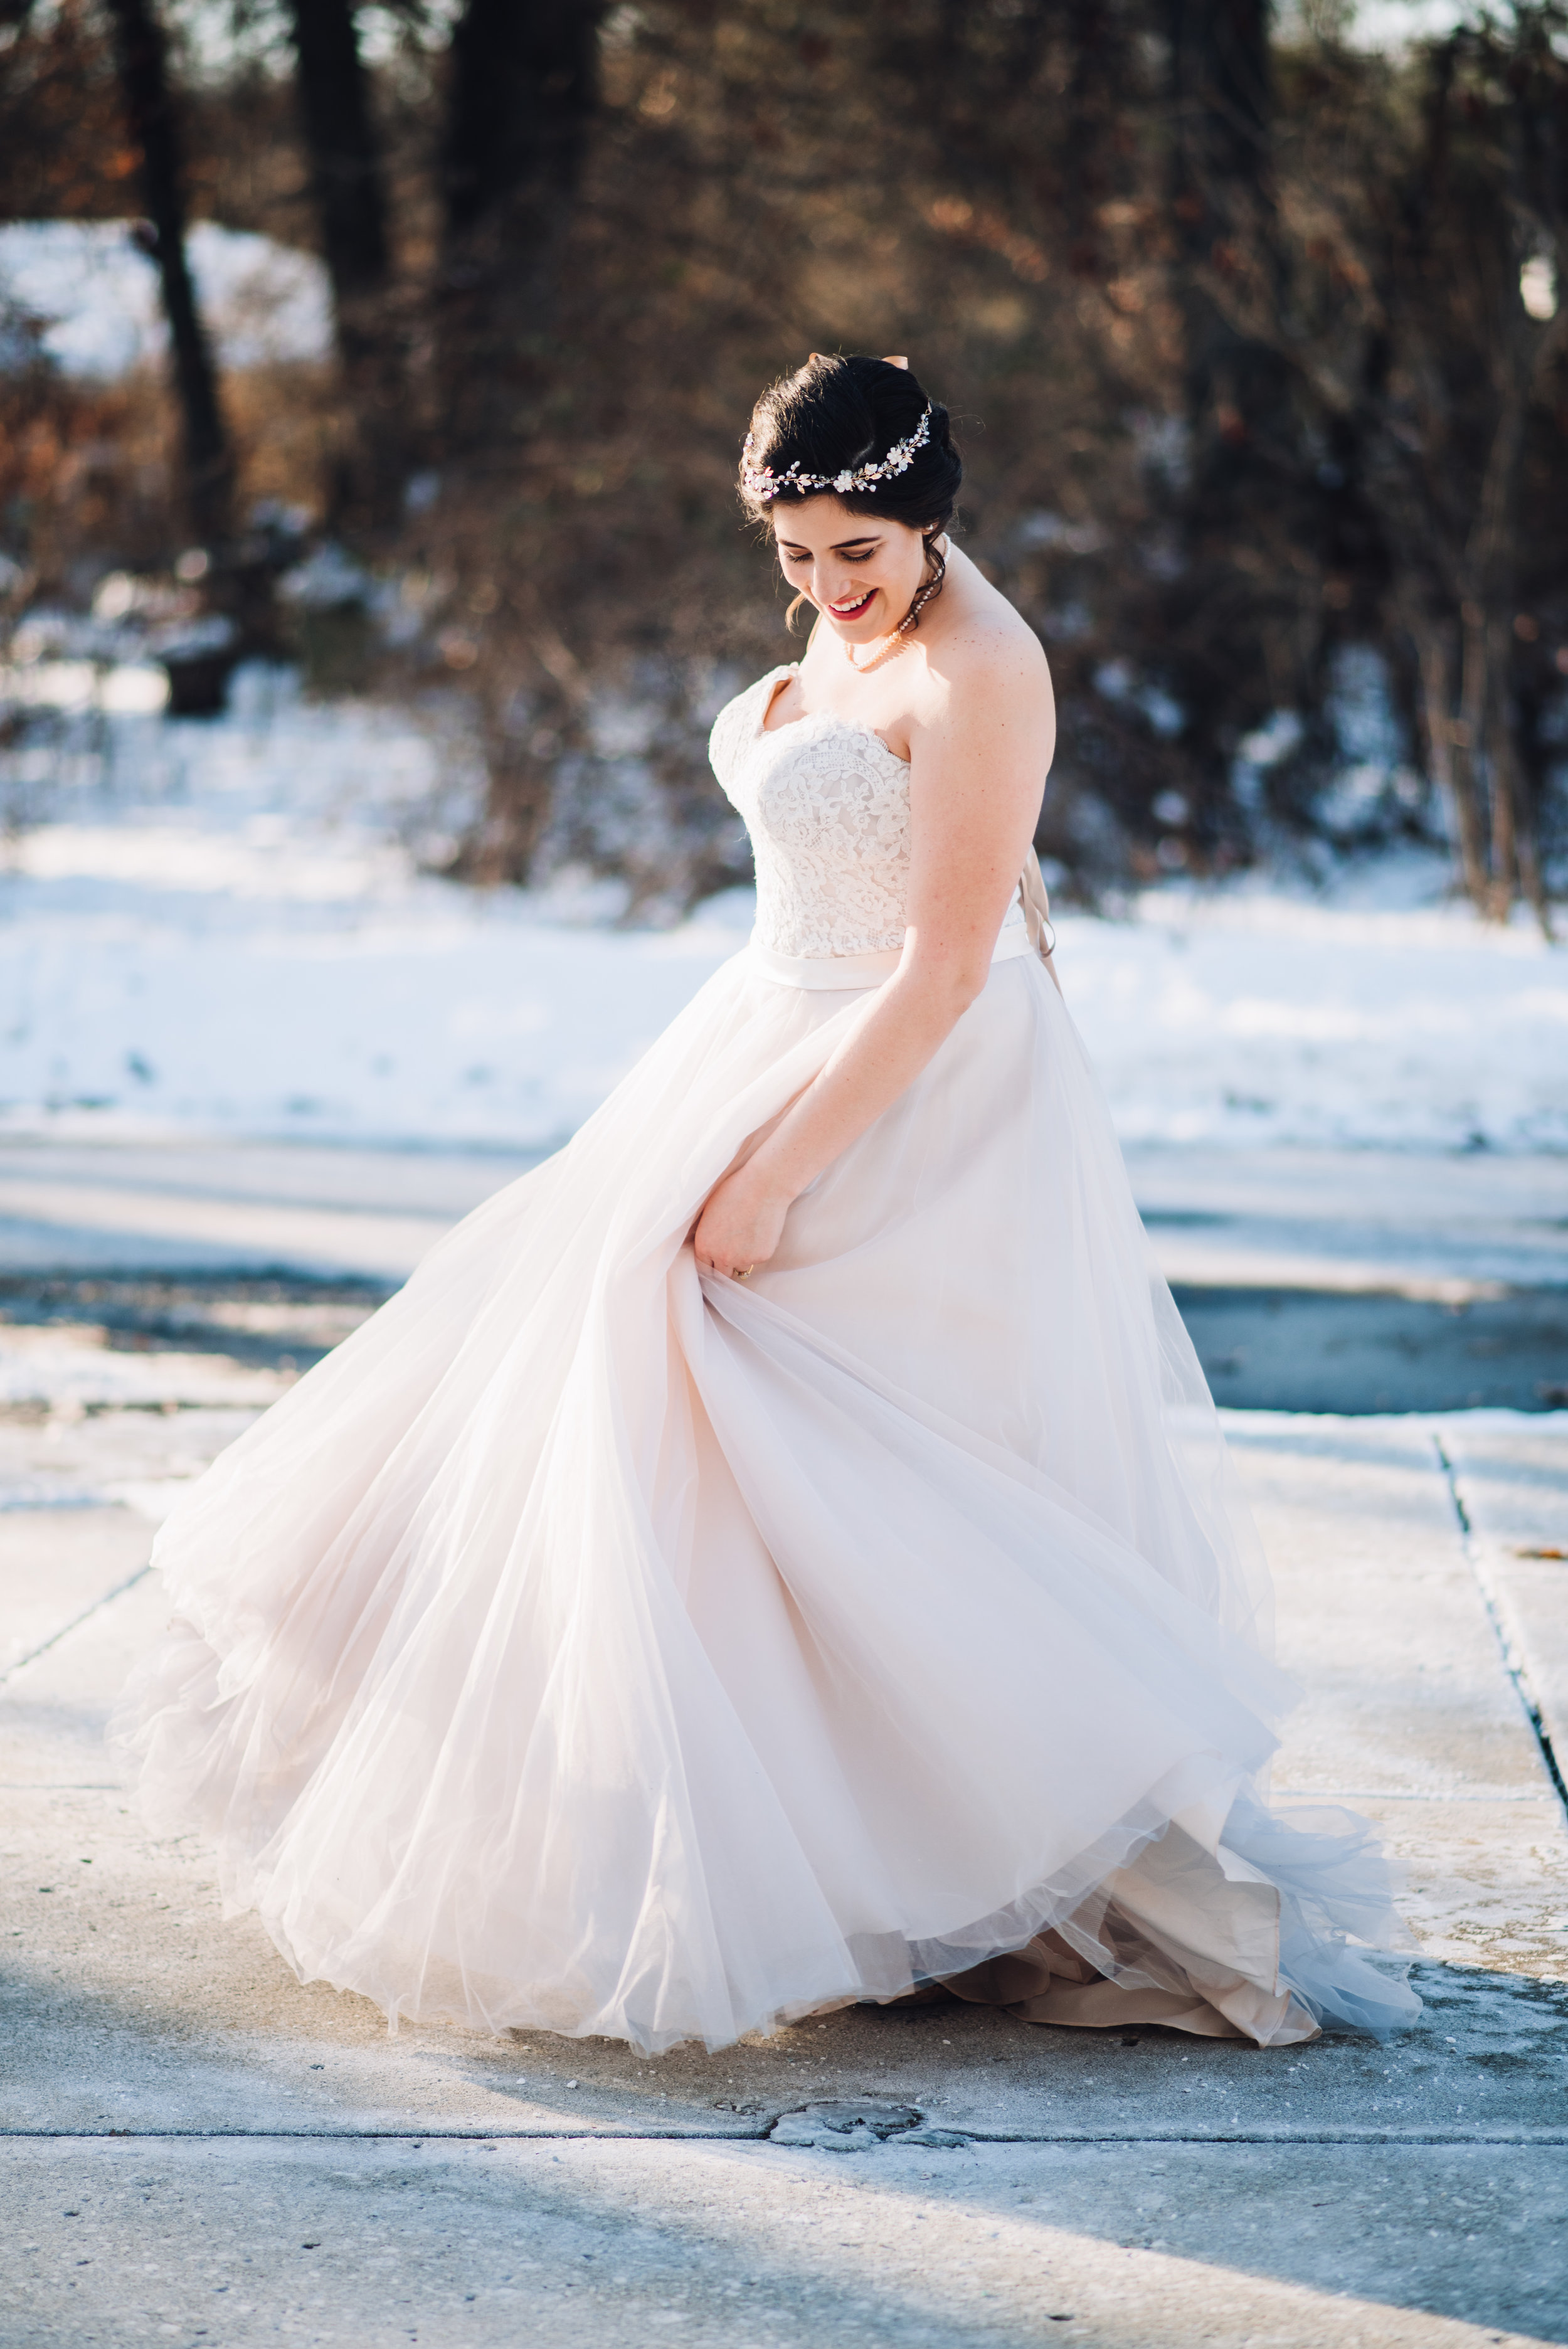 Bride dancing in the snow